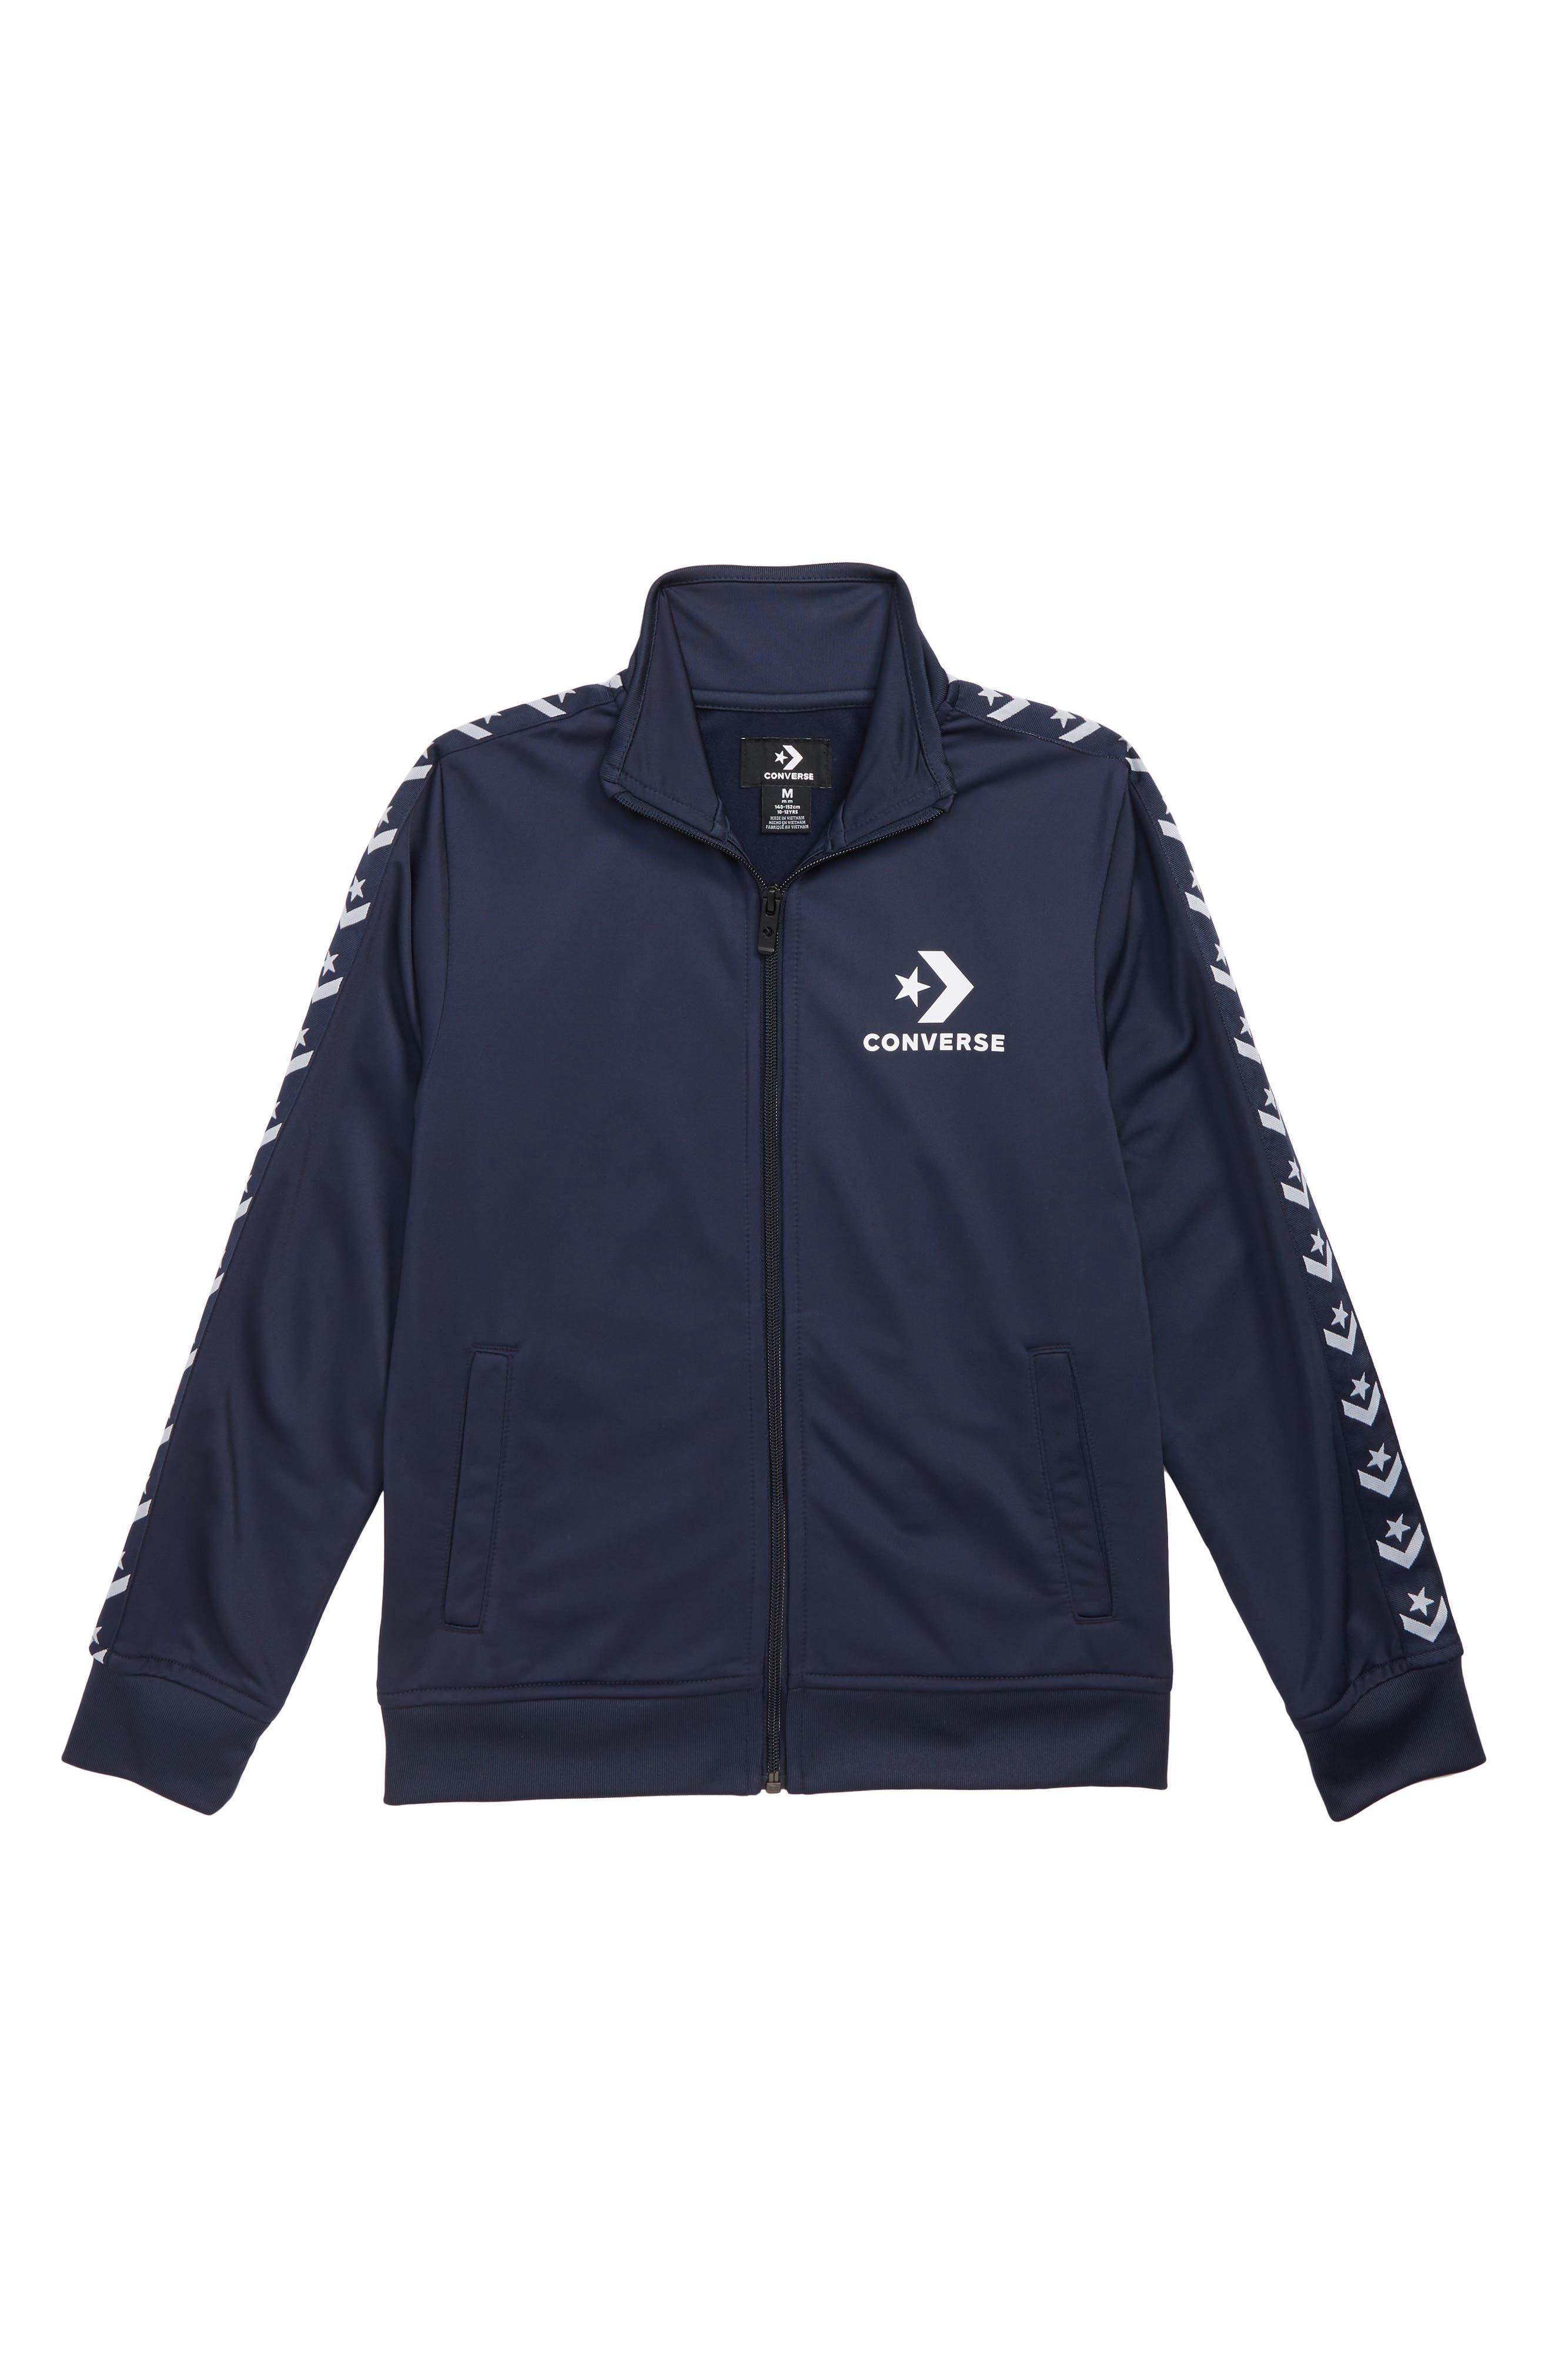 CONVERSE Track Jacket, Main, color, 418